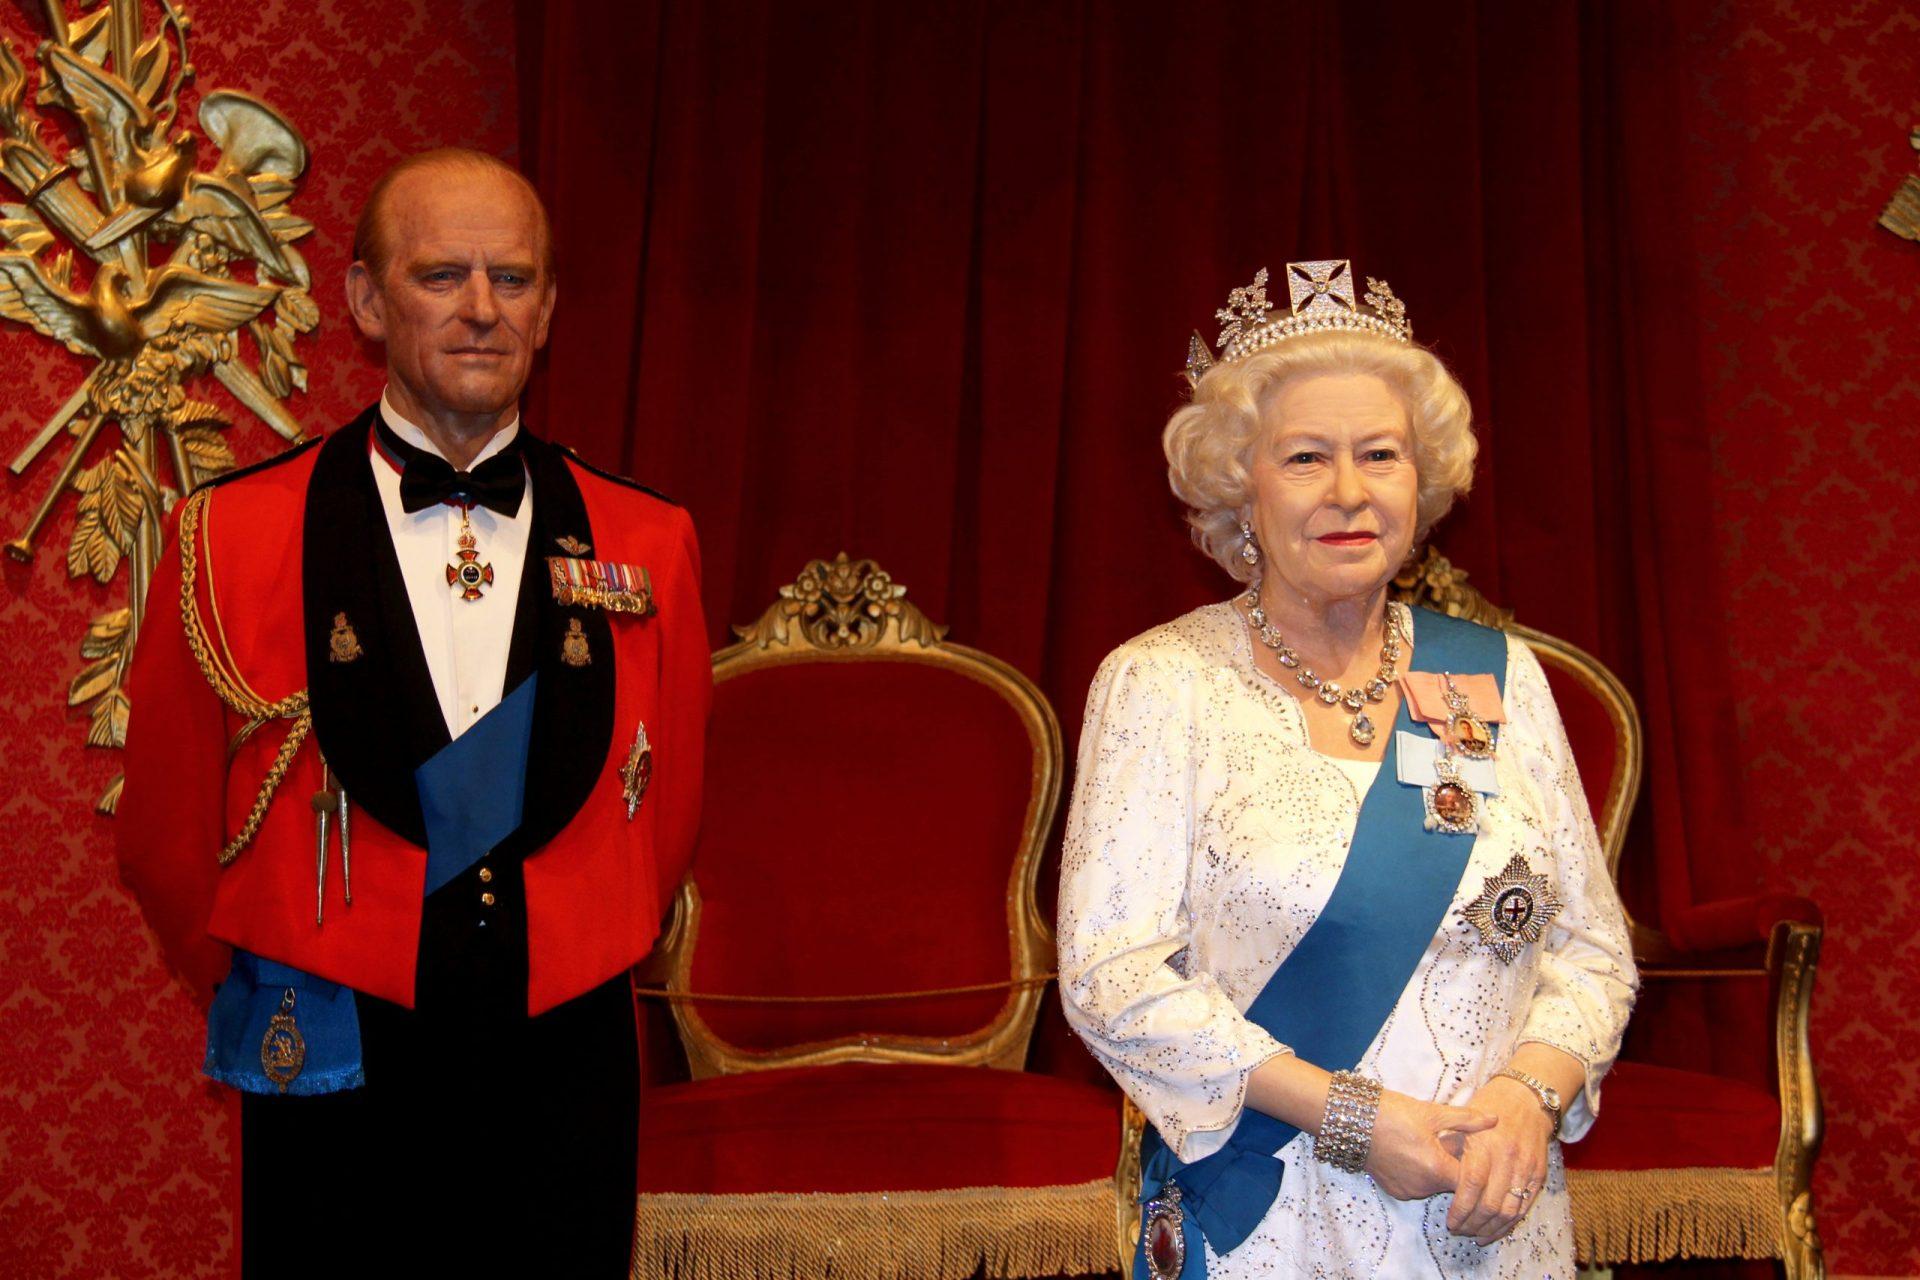 Prințul Philip, soțul reginei Elisabeta a II-a a Marii Britanii a decedat